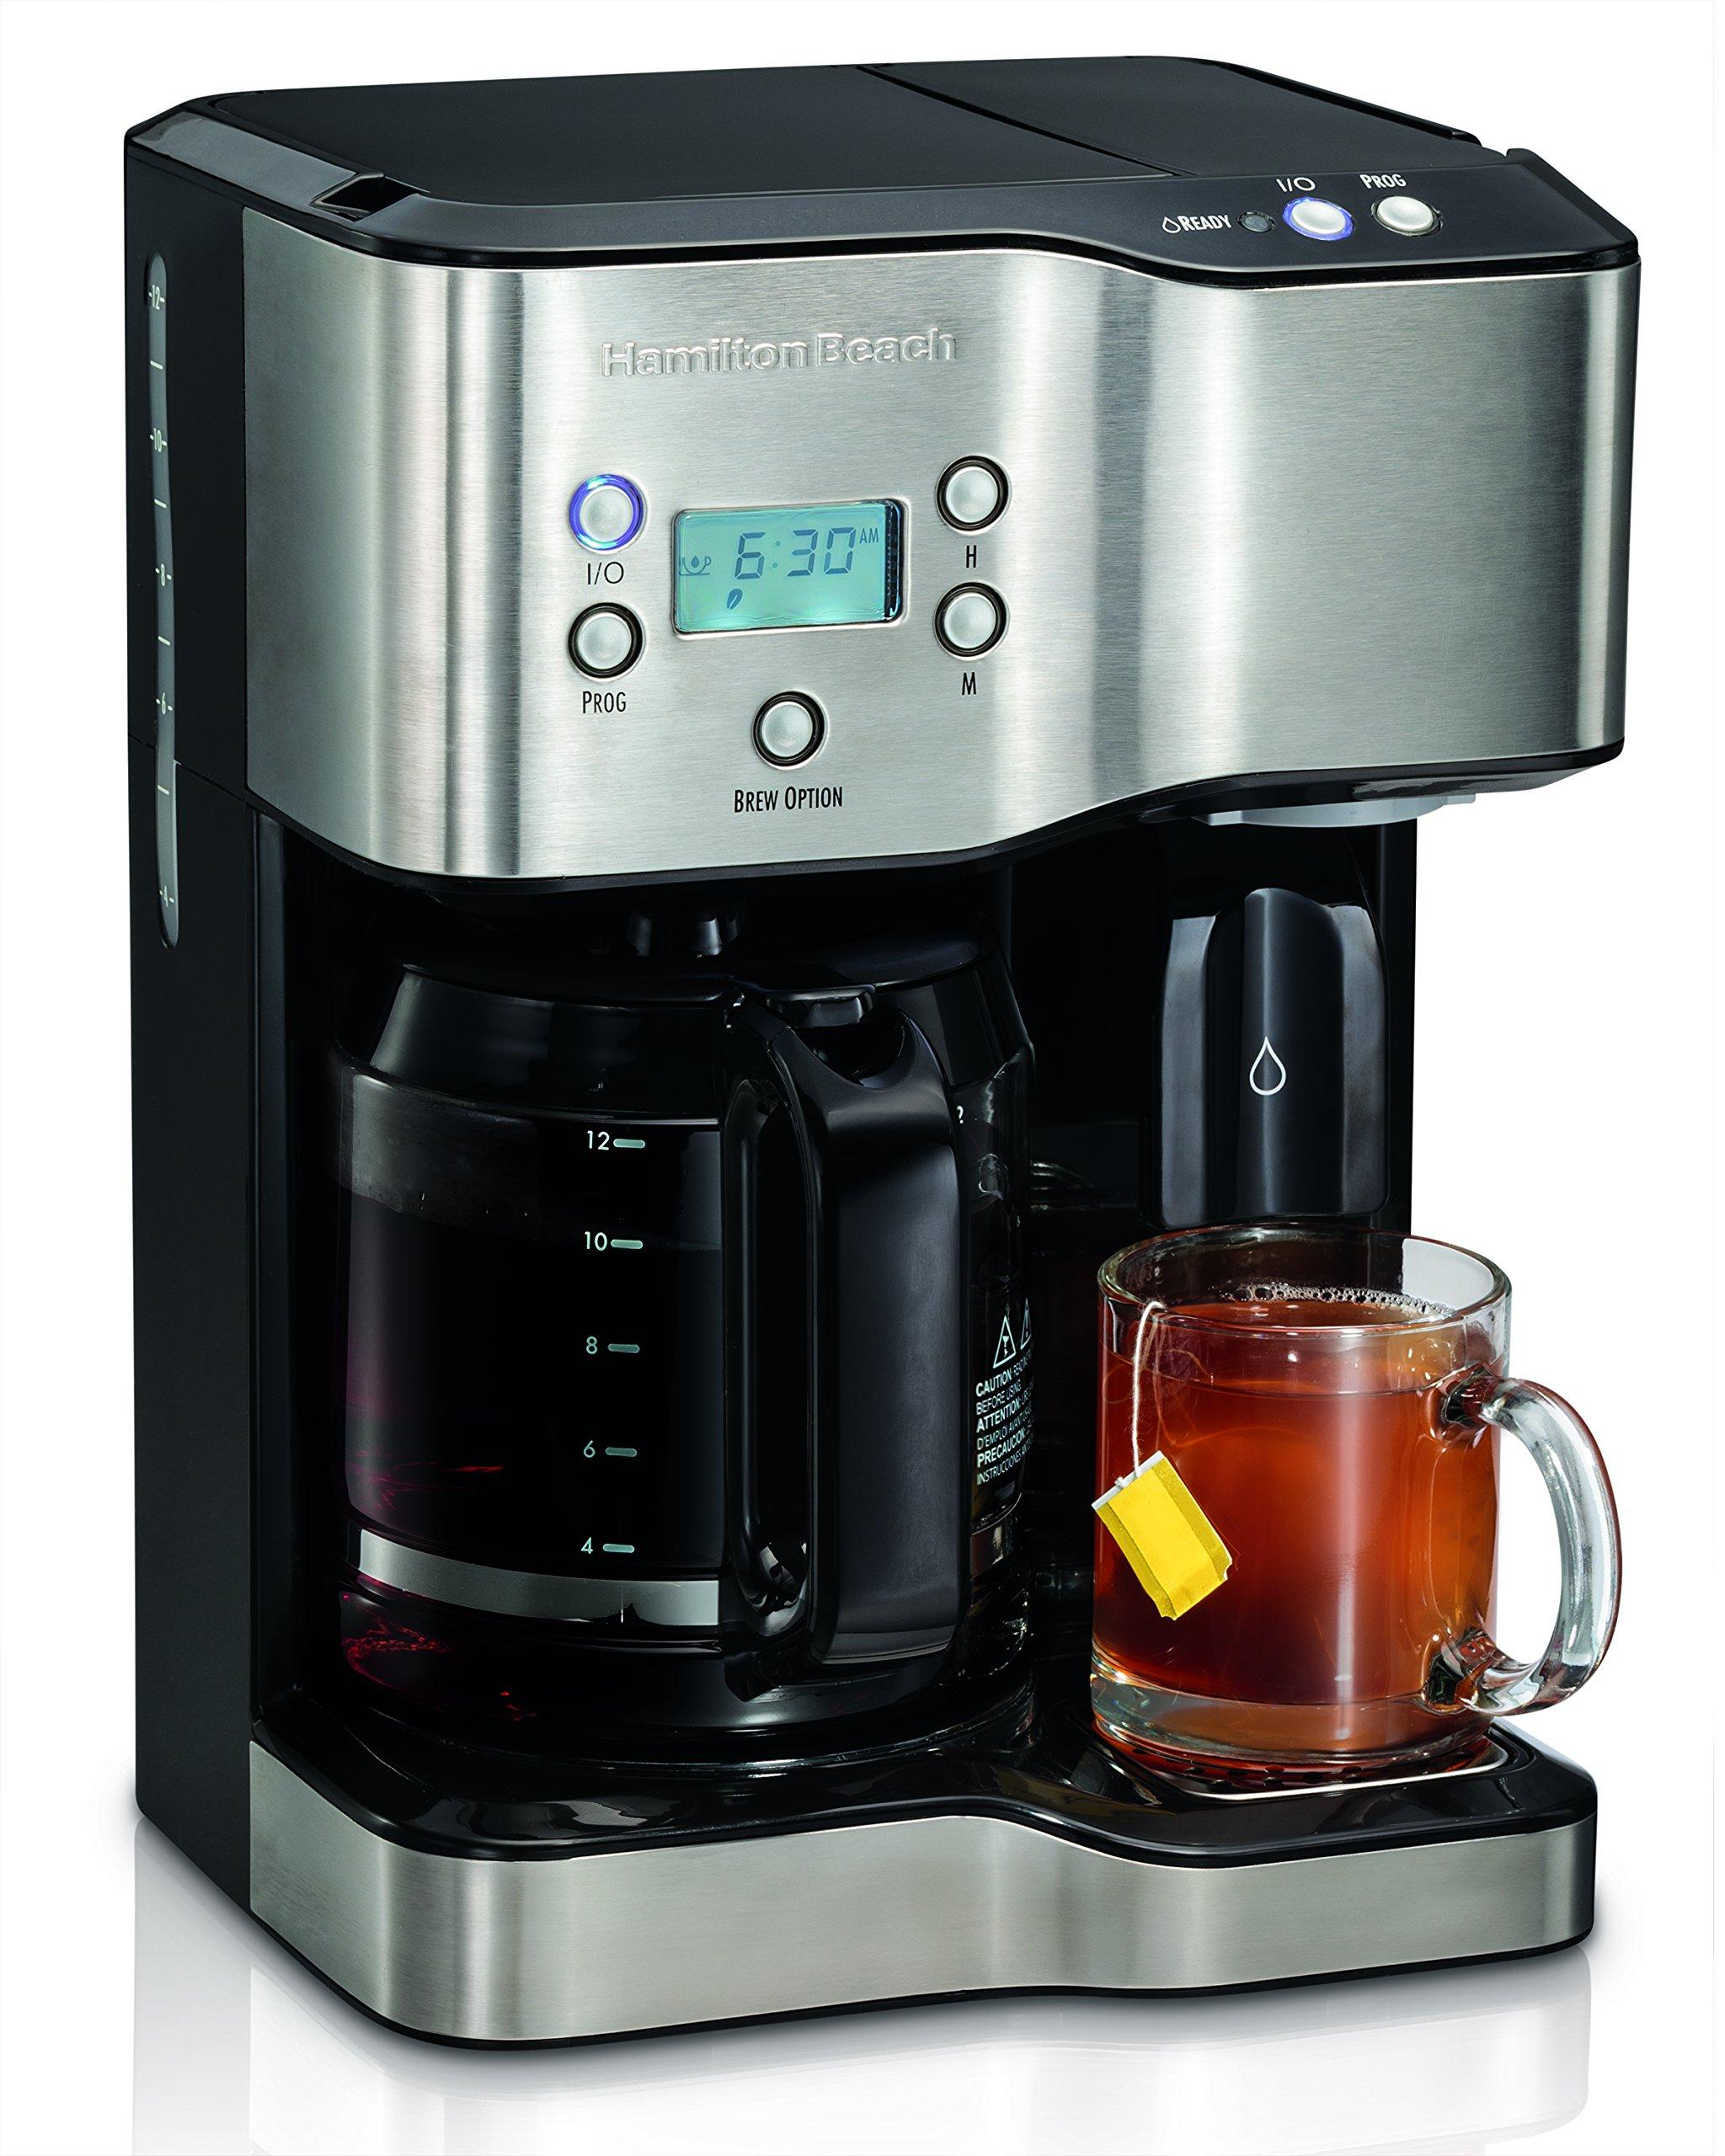 Hamilton Beach 49982 Coffee Maker & Hot Water Dispenser, Black